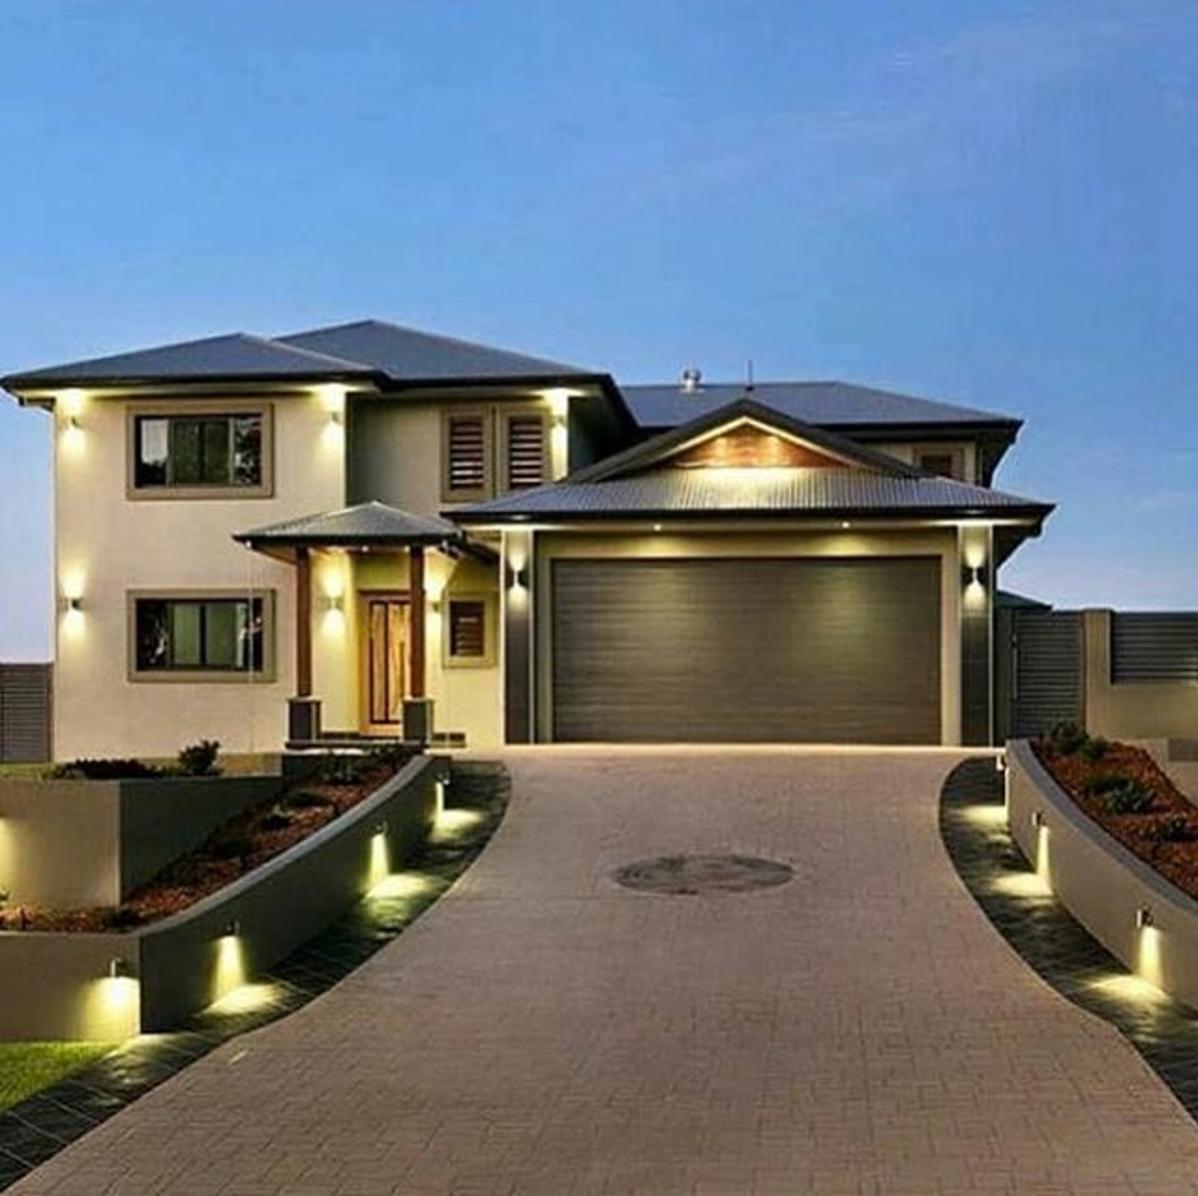 77 Beautiful Houses 2018 Homes Design